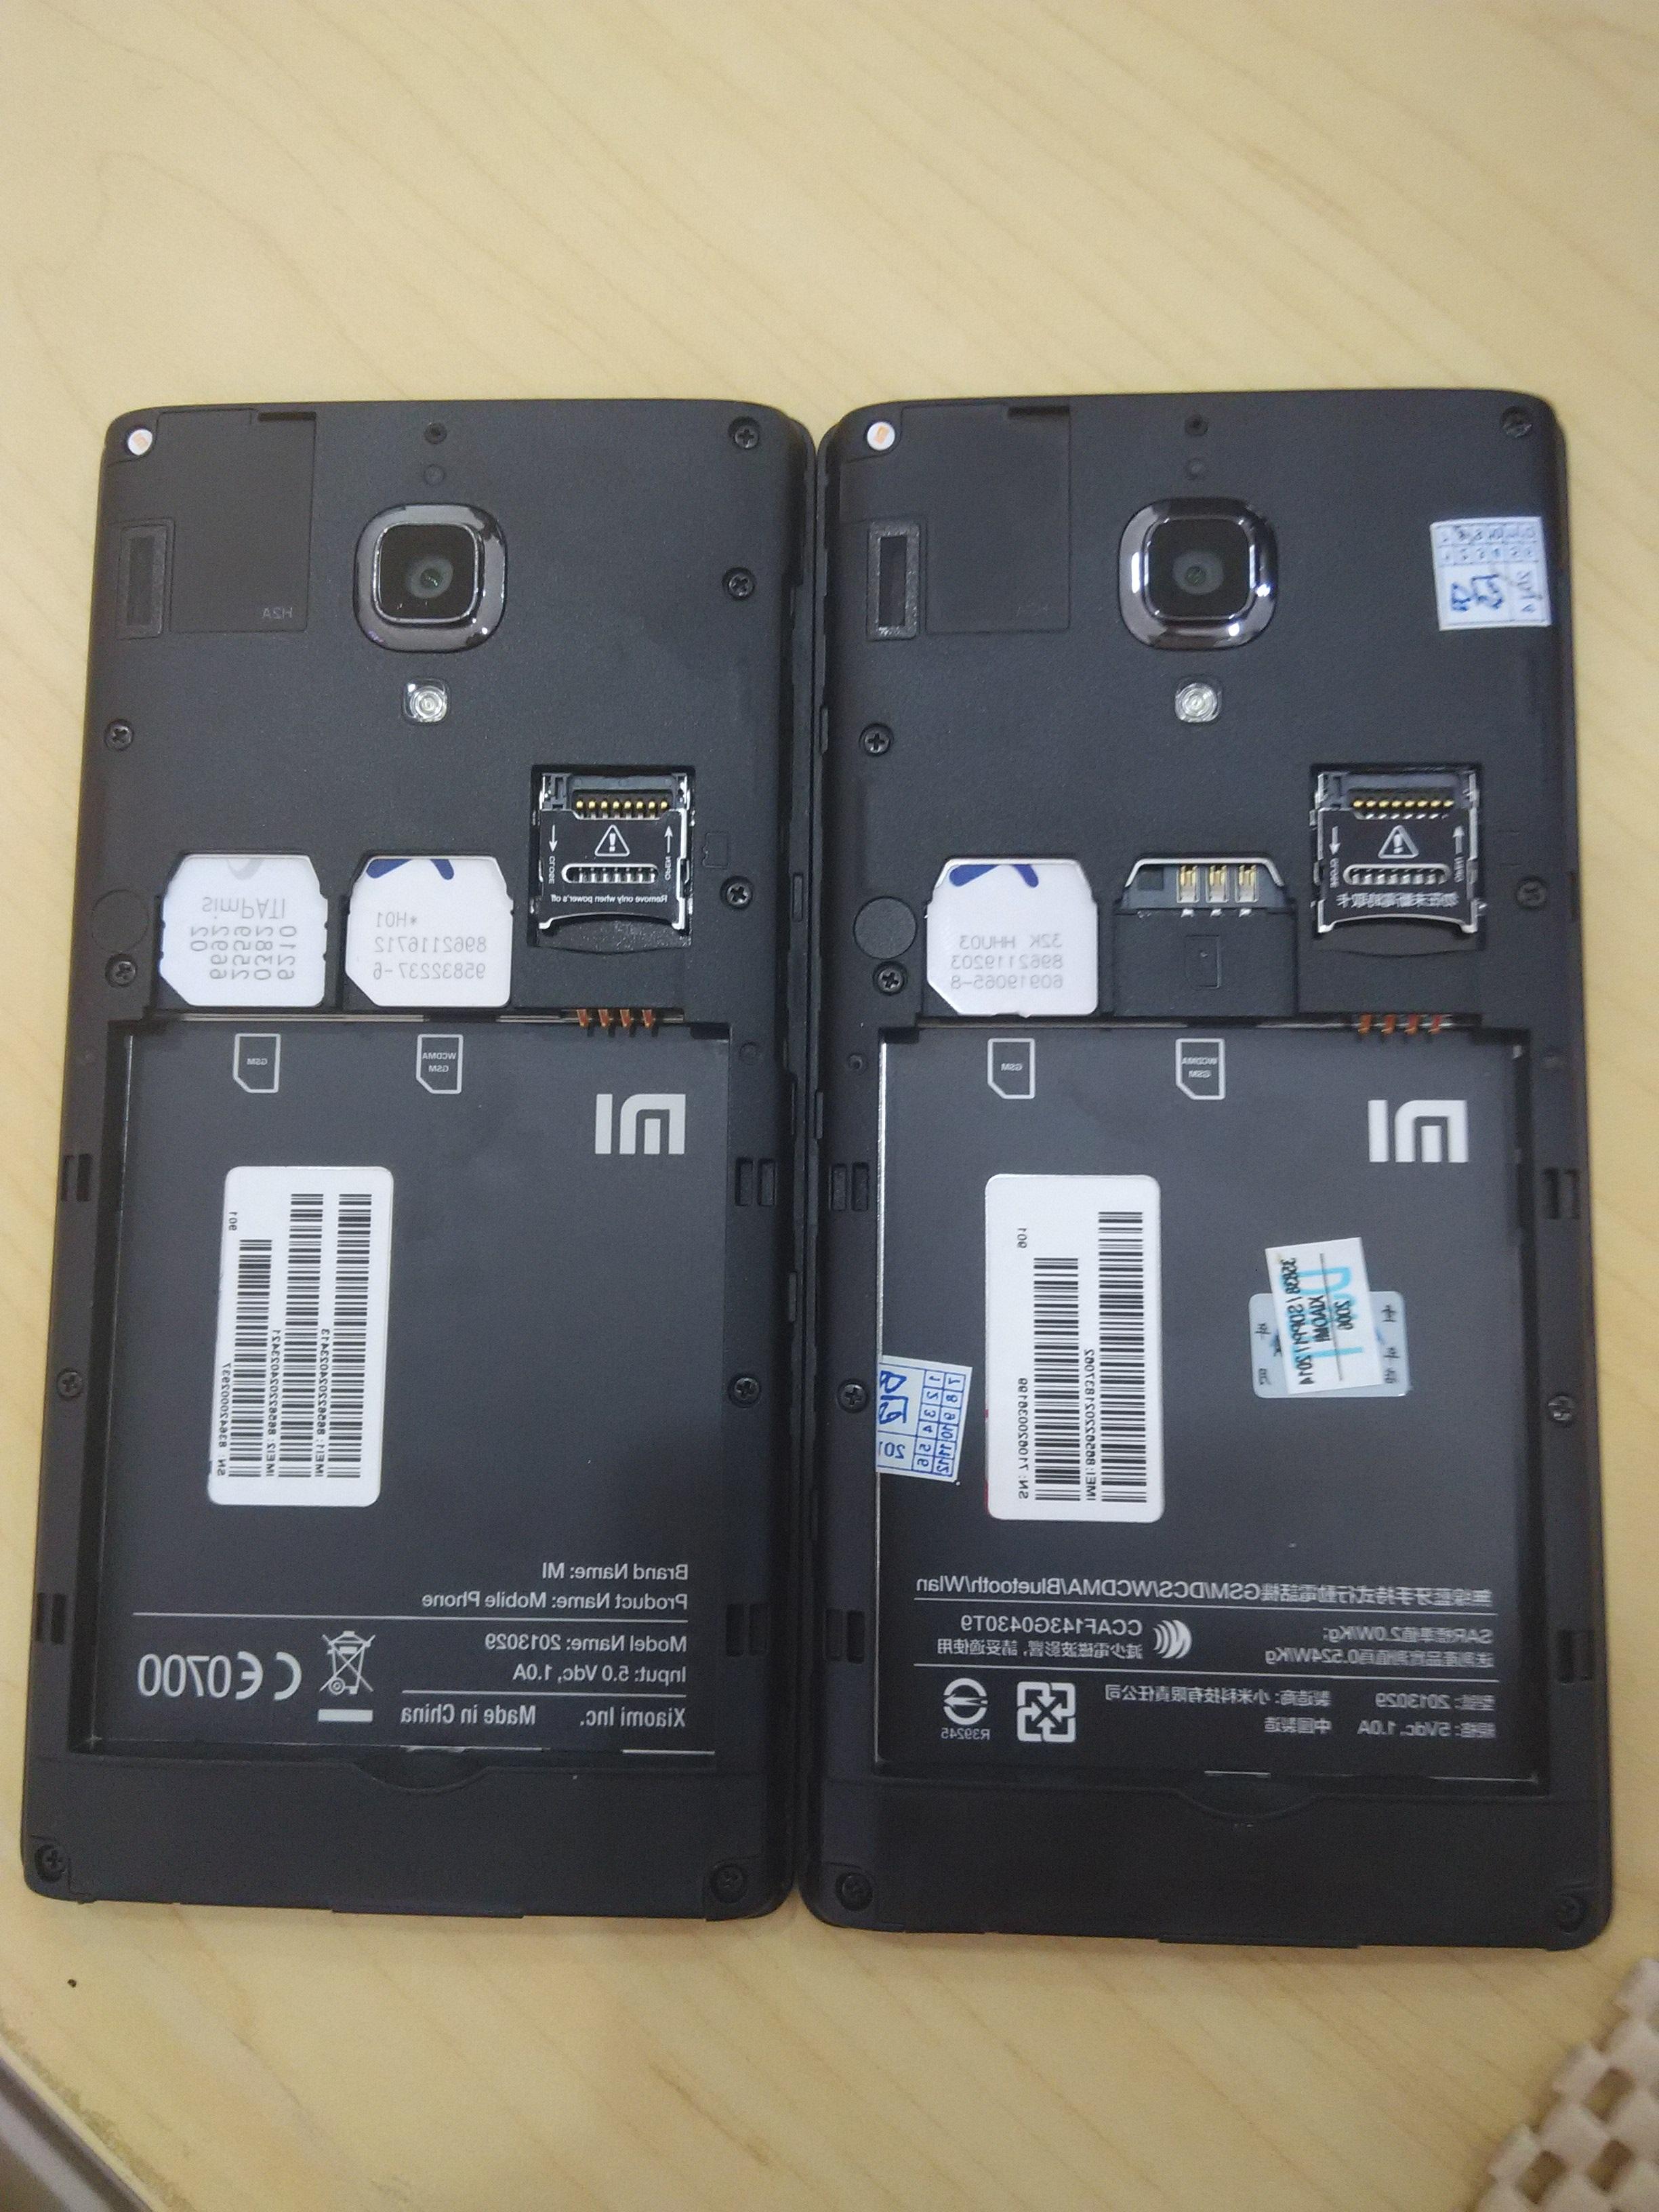 Berapa Biaya Jasa Service Xiaomi Redmi 1s?